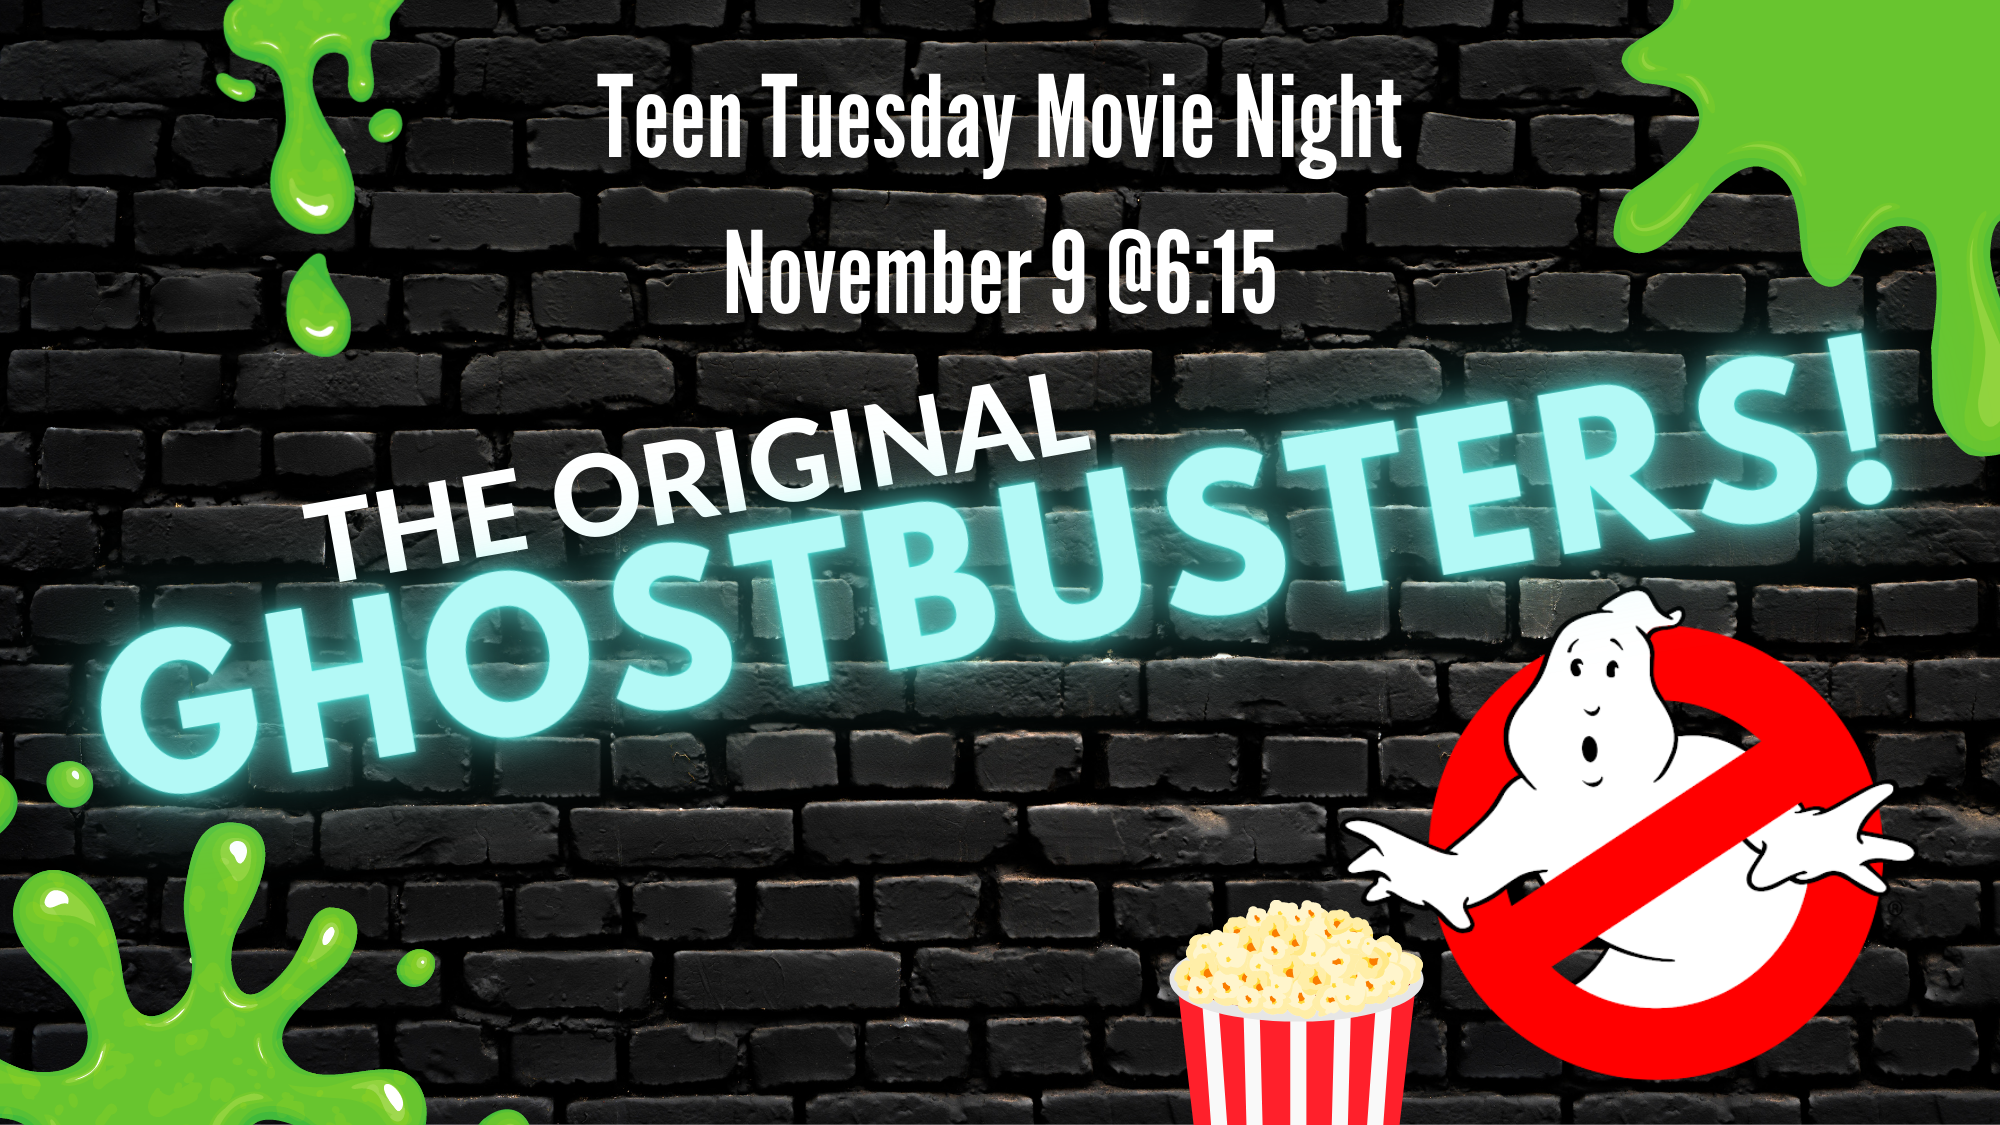 Teen Tuesday Movie Night